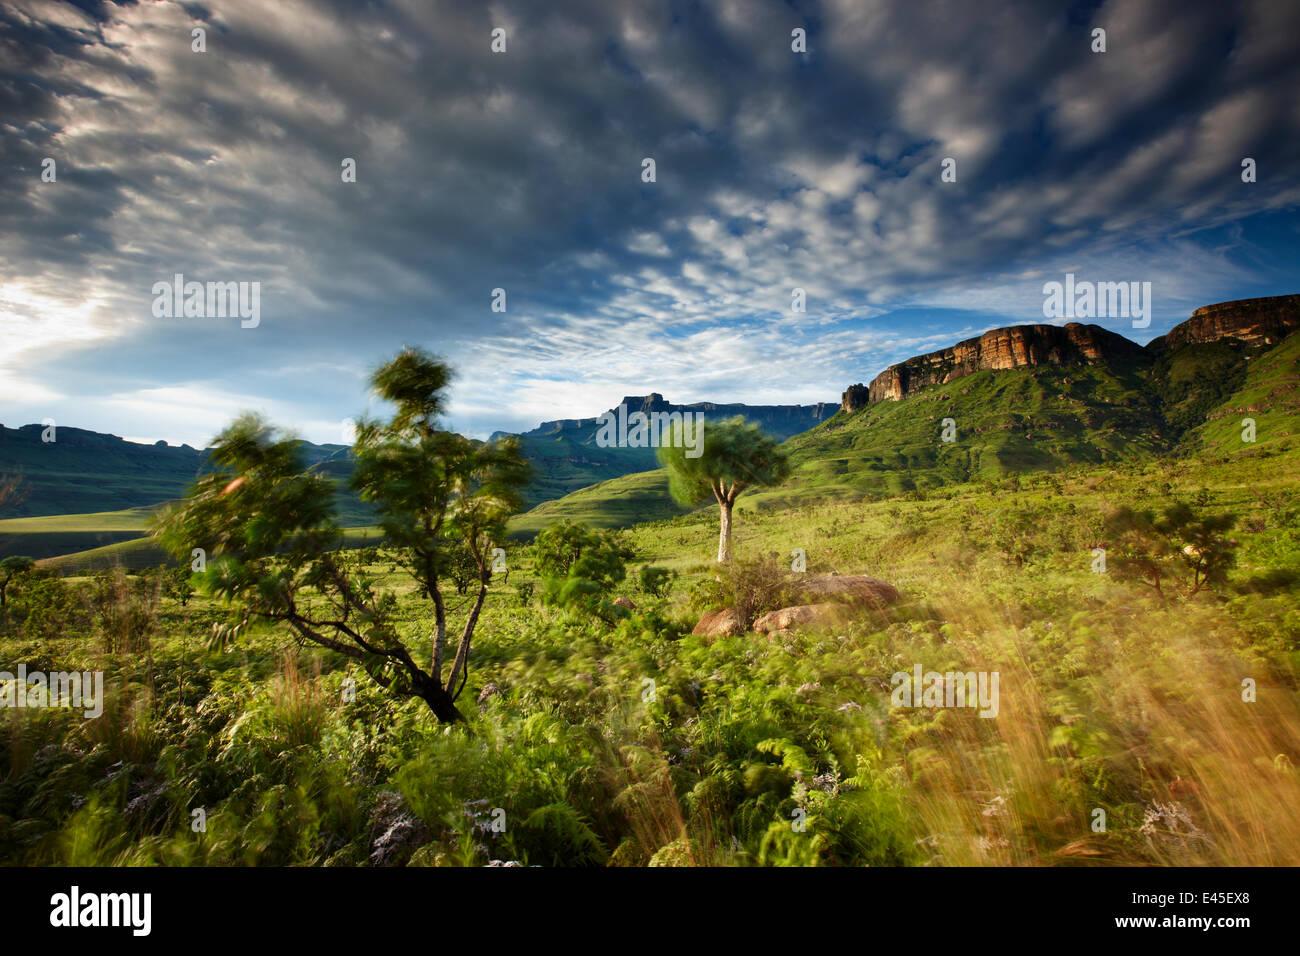 The Ampitheatre, Royal Natal National Park, Drakensberg Mountains, KwaZuluNatal, South Africa - Stock Image